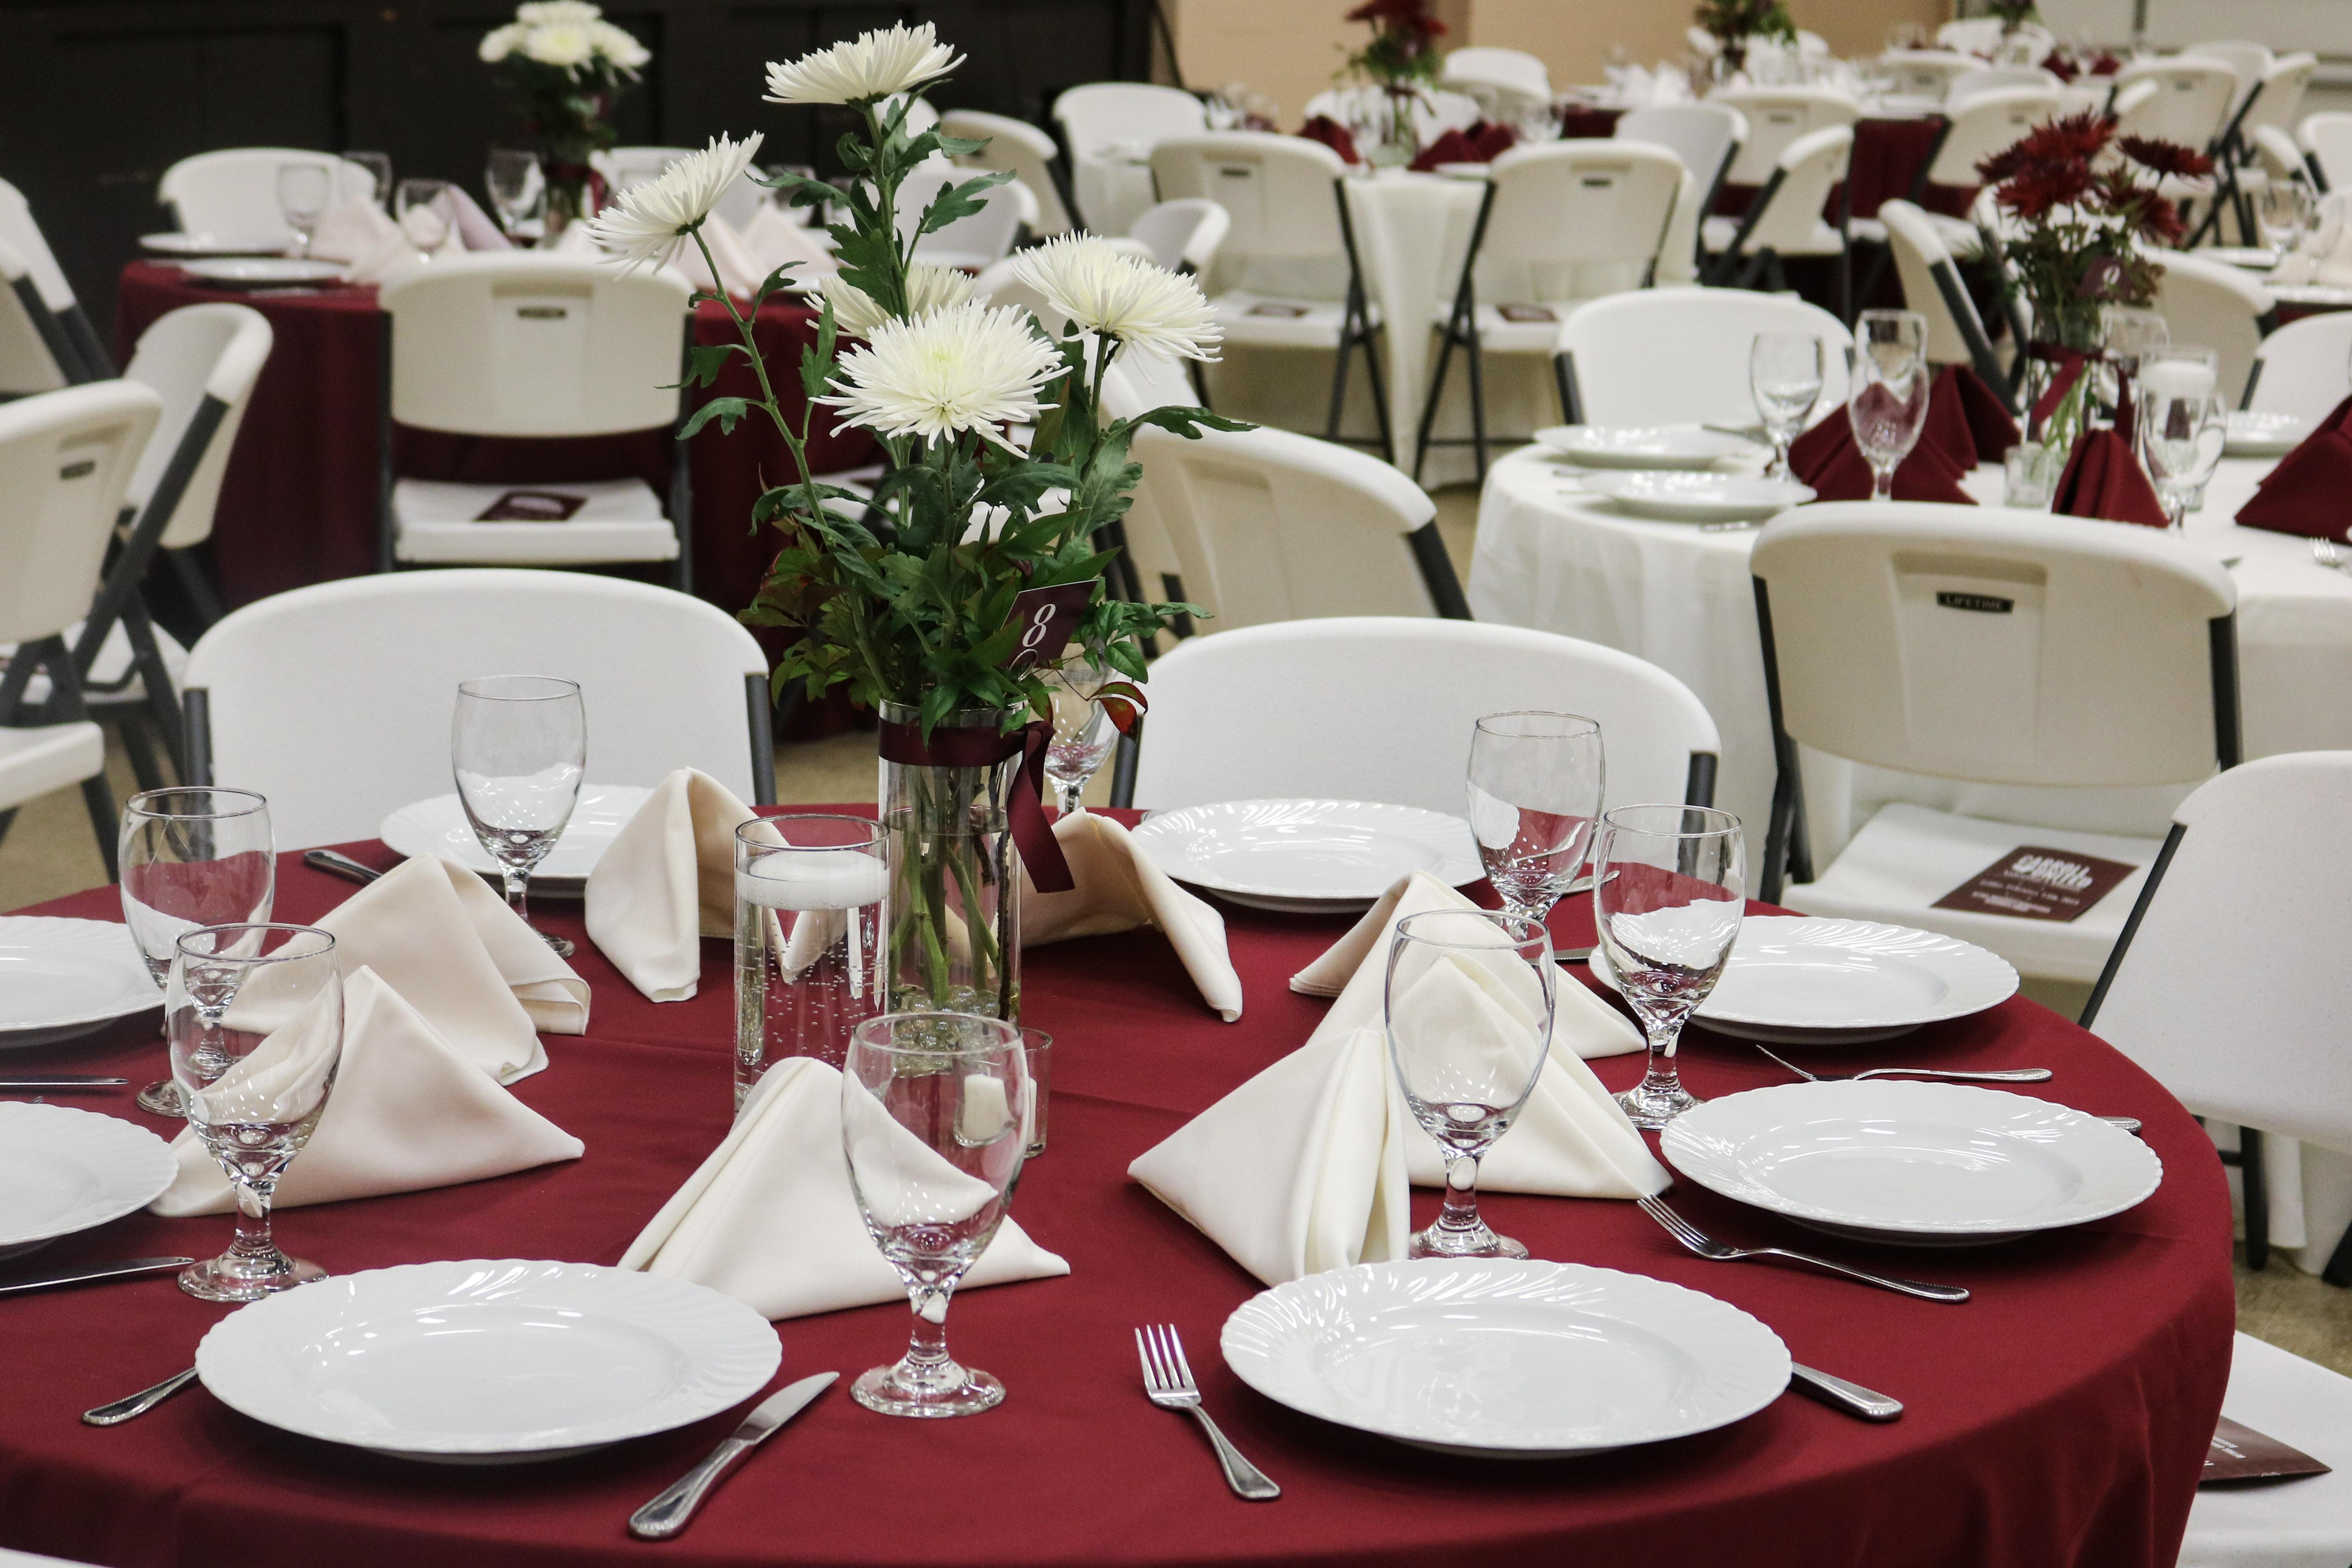 United Way Raises Over $7,000 at Valentine's Dinner